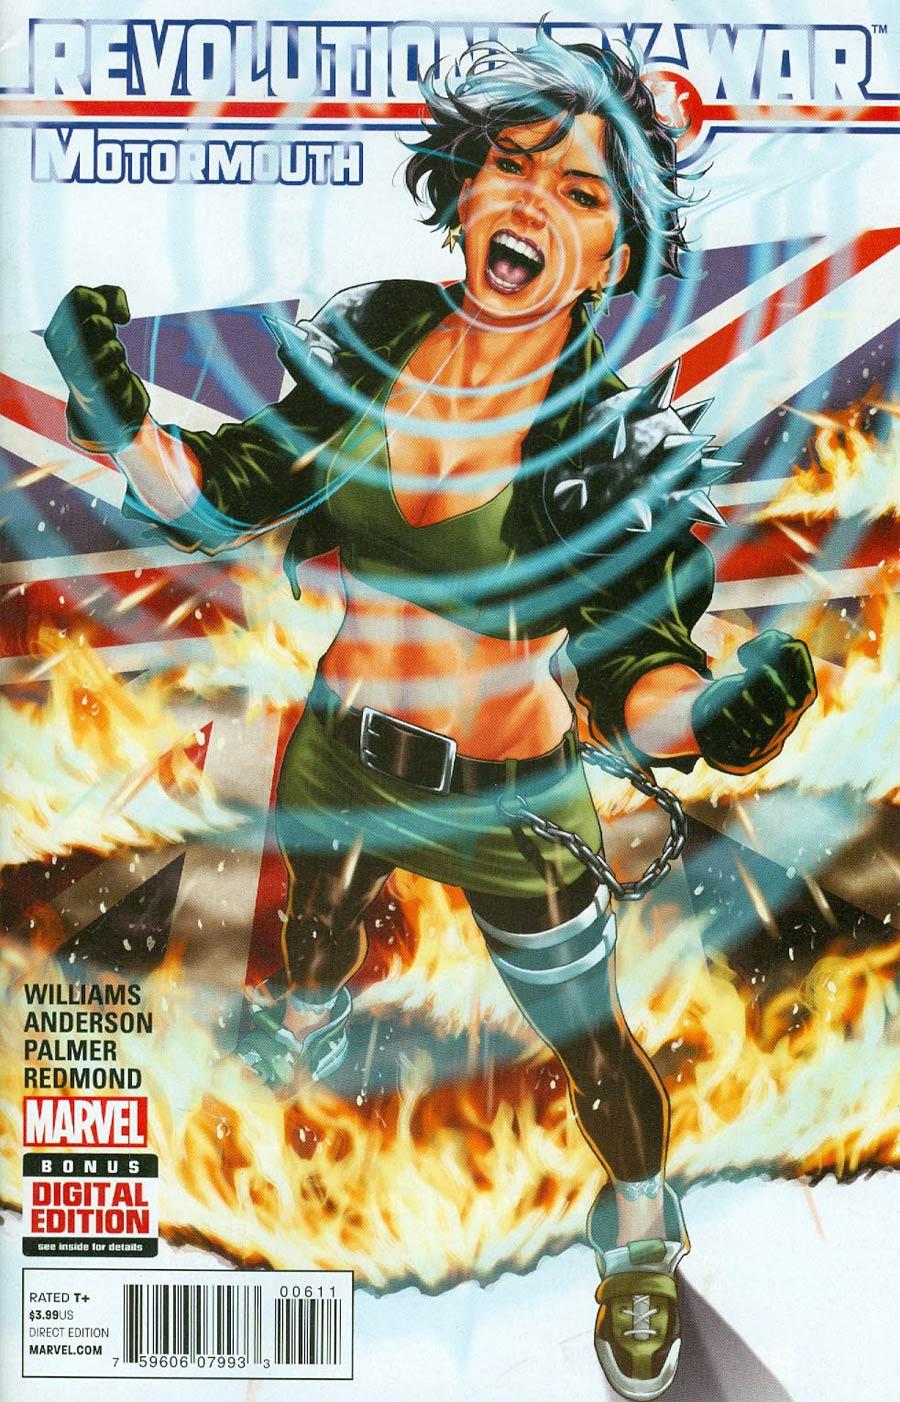 Revolutionary War Motormouth #1 Cover A Regular Mark Brooks Cover (Revolutionary War Part 6)